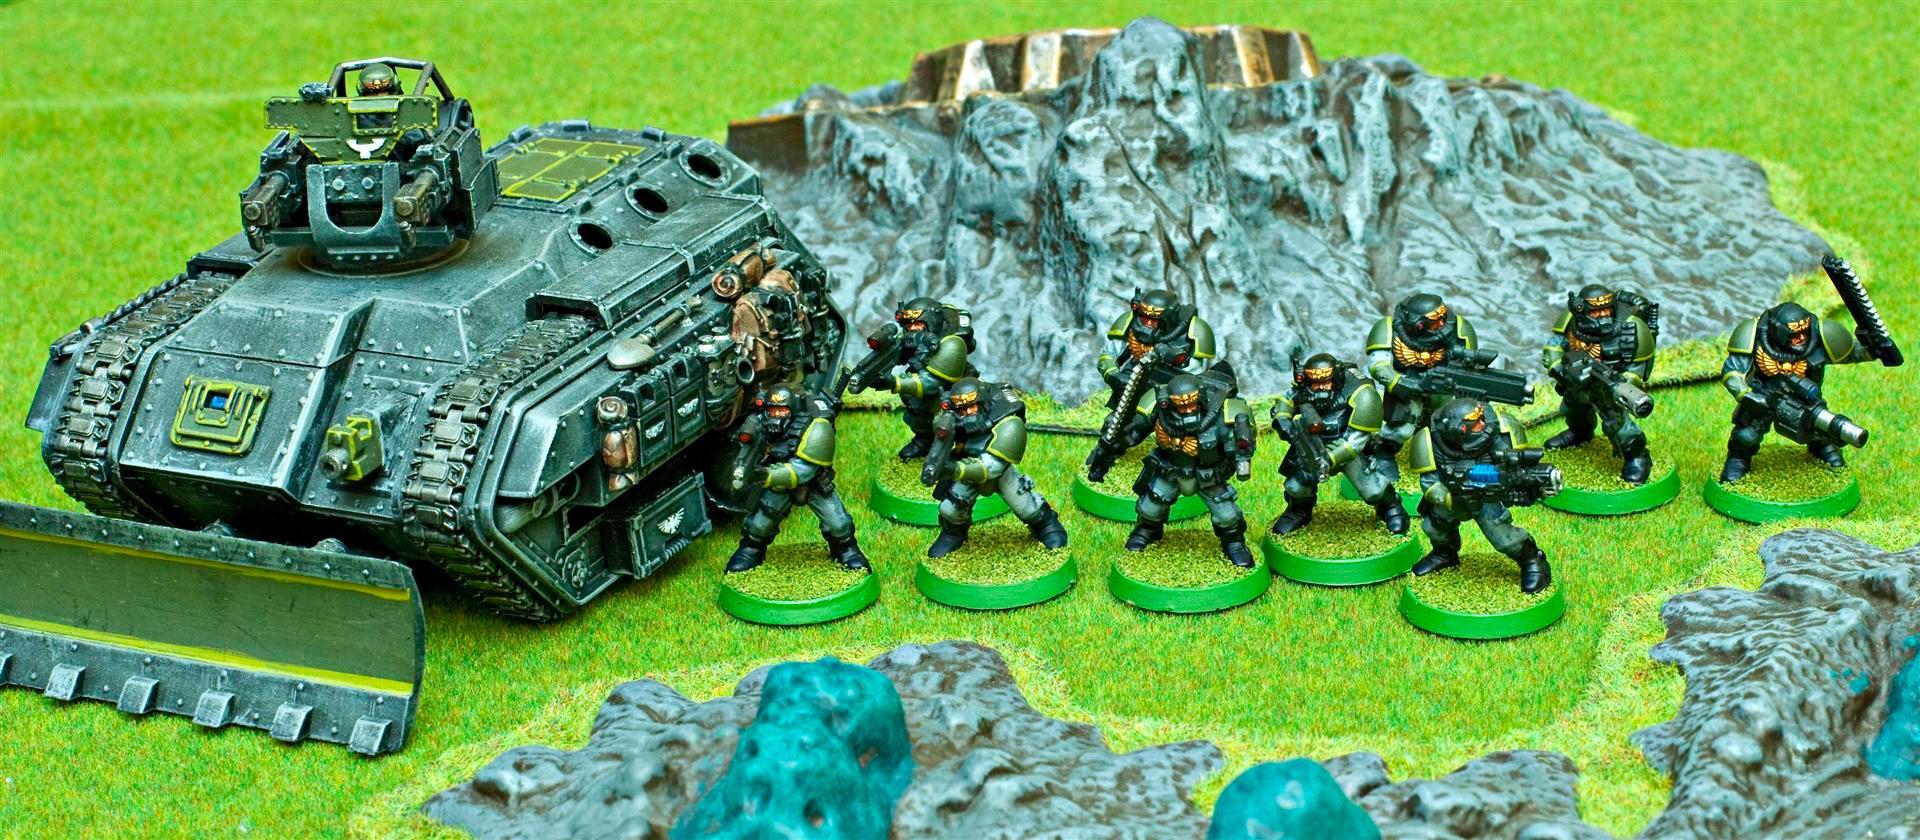 Apocalypse, Army, Carapace, Carapace Armour, Chimera, Chimeras, Dozerblade, Flamer, Grenadier, Grenadiers, Heavy Flamer, Imperial, Imperial Guard, Imperials, Veteran, Veteran Squad